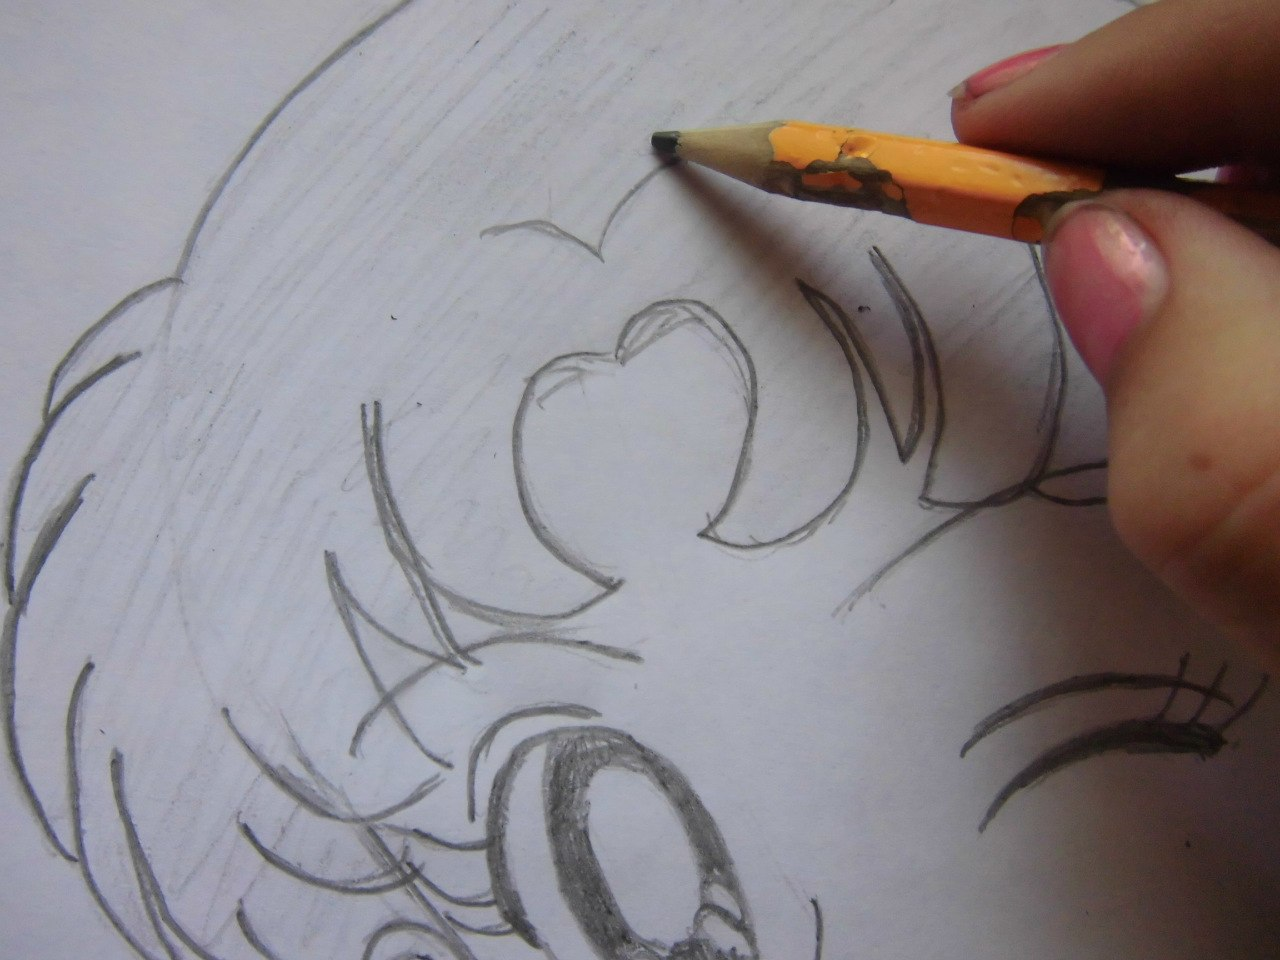 рисунки карандашом для срисовки про спорт